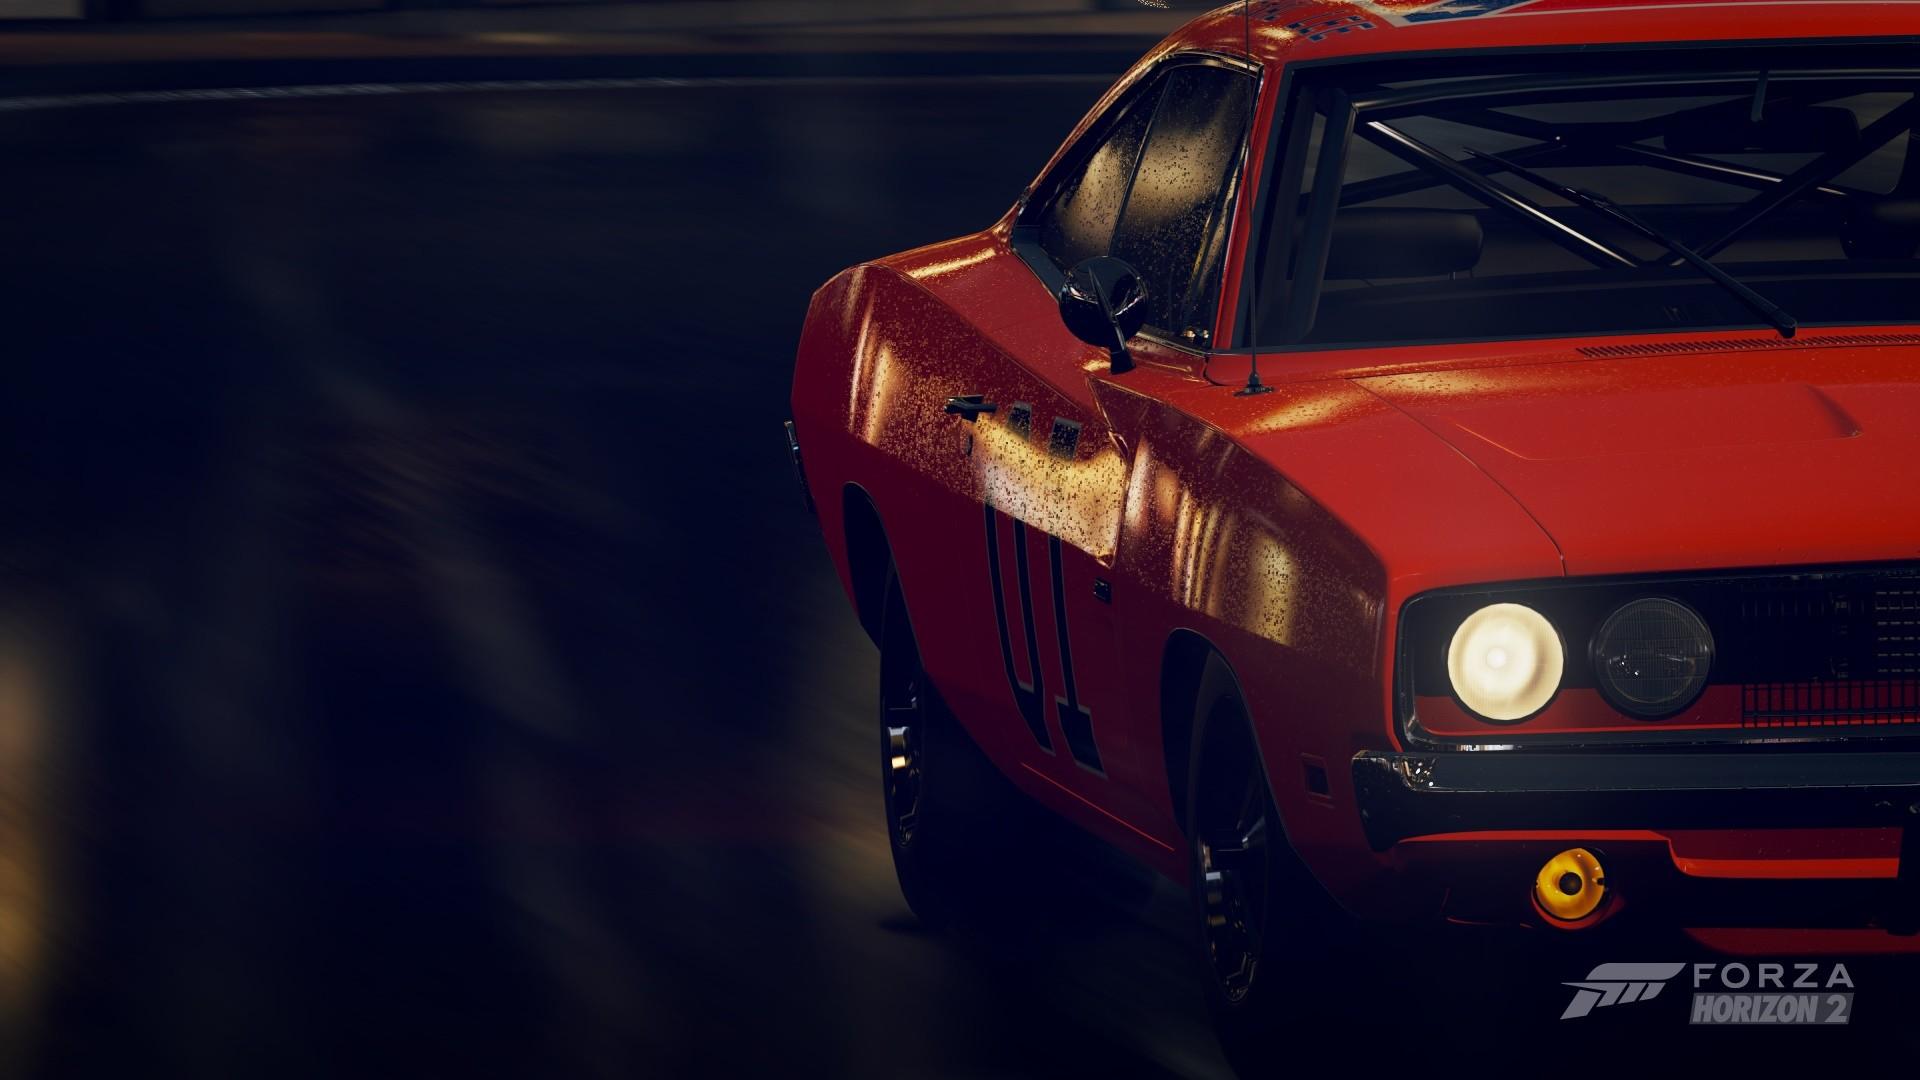 Wallpaper Night Orange Cars Sports Car Drift Forza Horizon 2